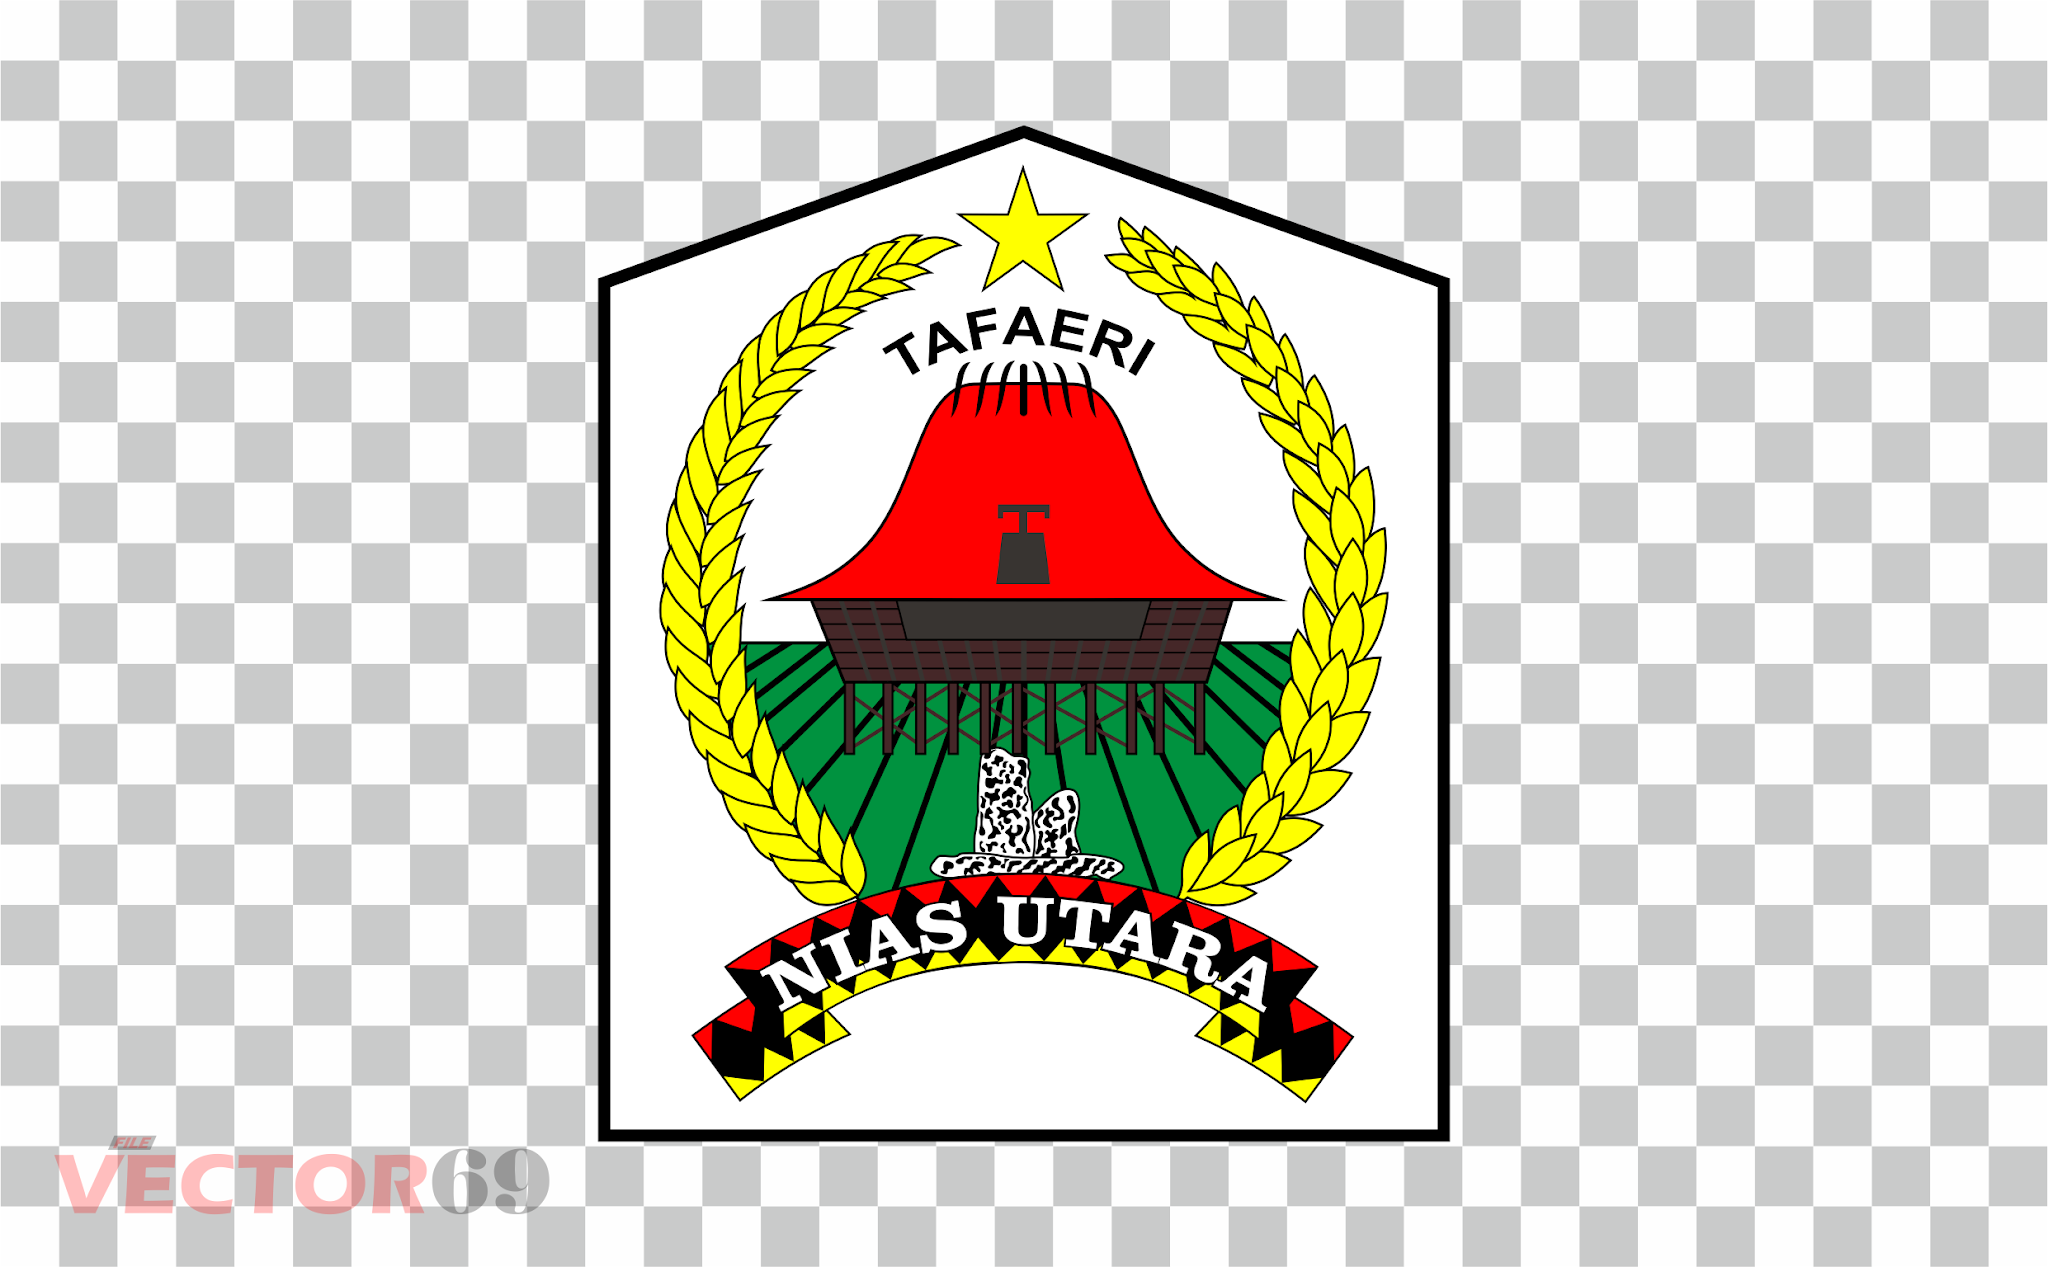 Kabupaten Nias Utara Logo - Download Vector File PNG (Portable Network Graphics)